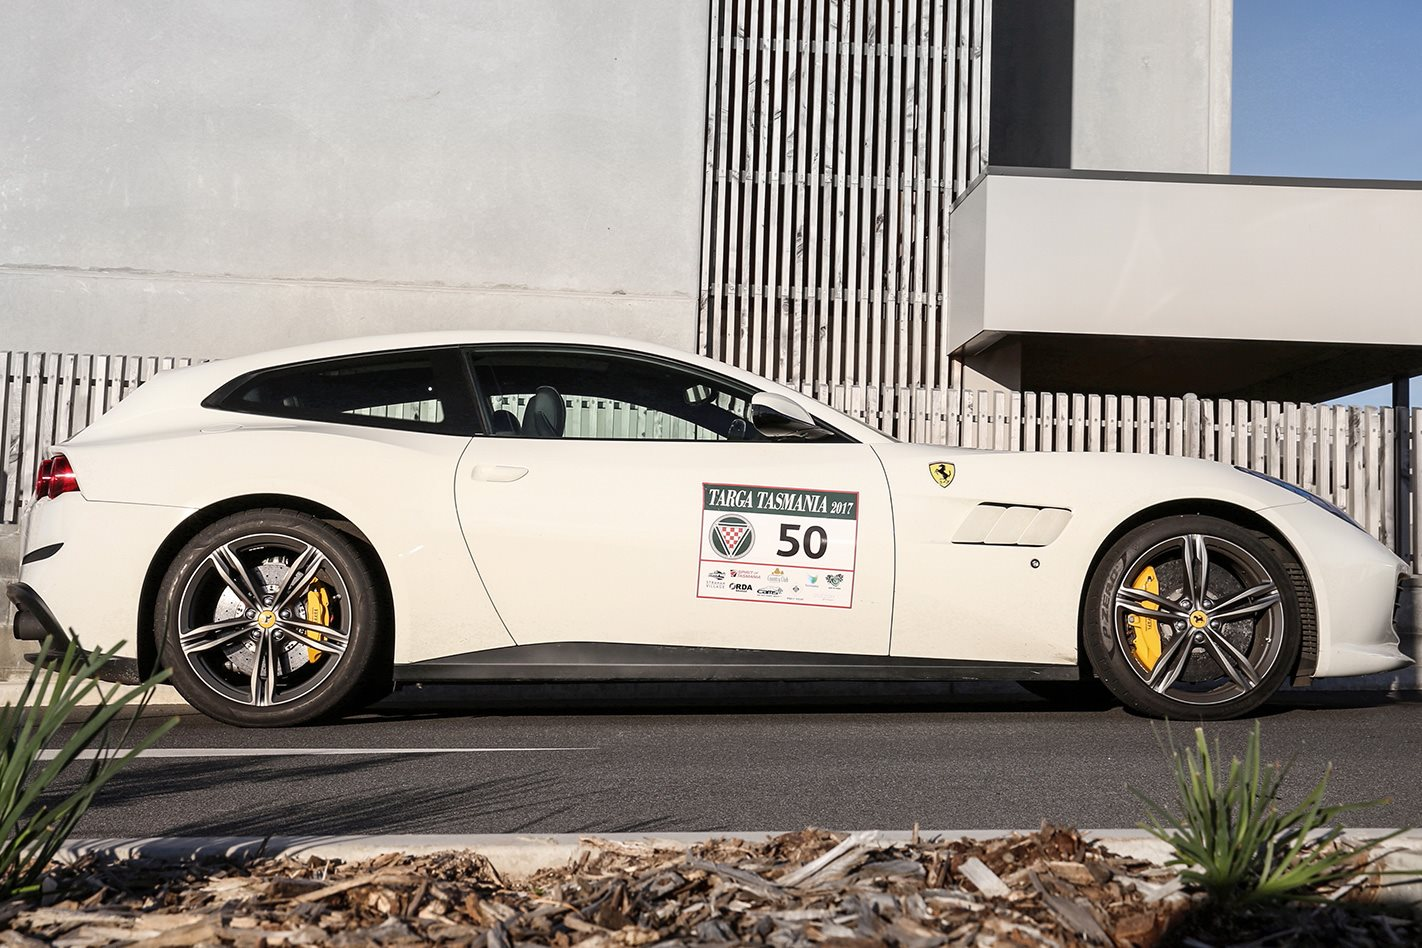 2017 Ferrari GTC4 Lusso side profile